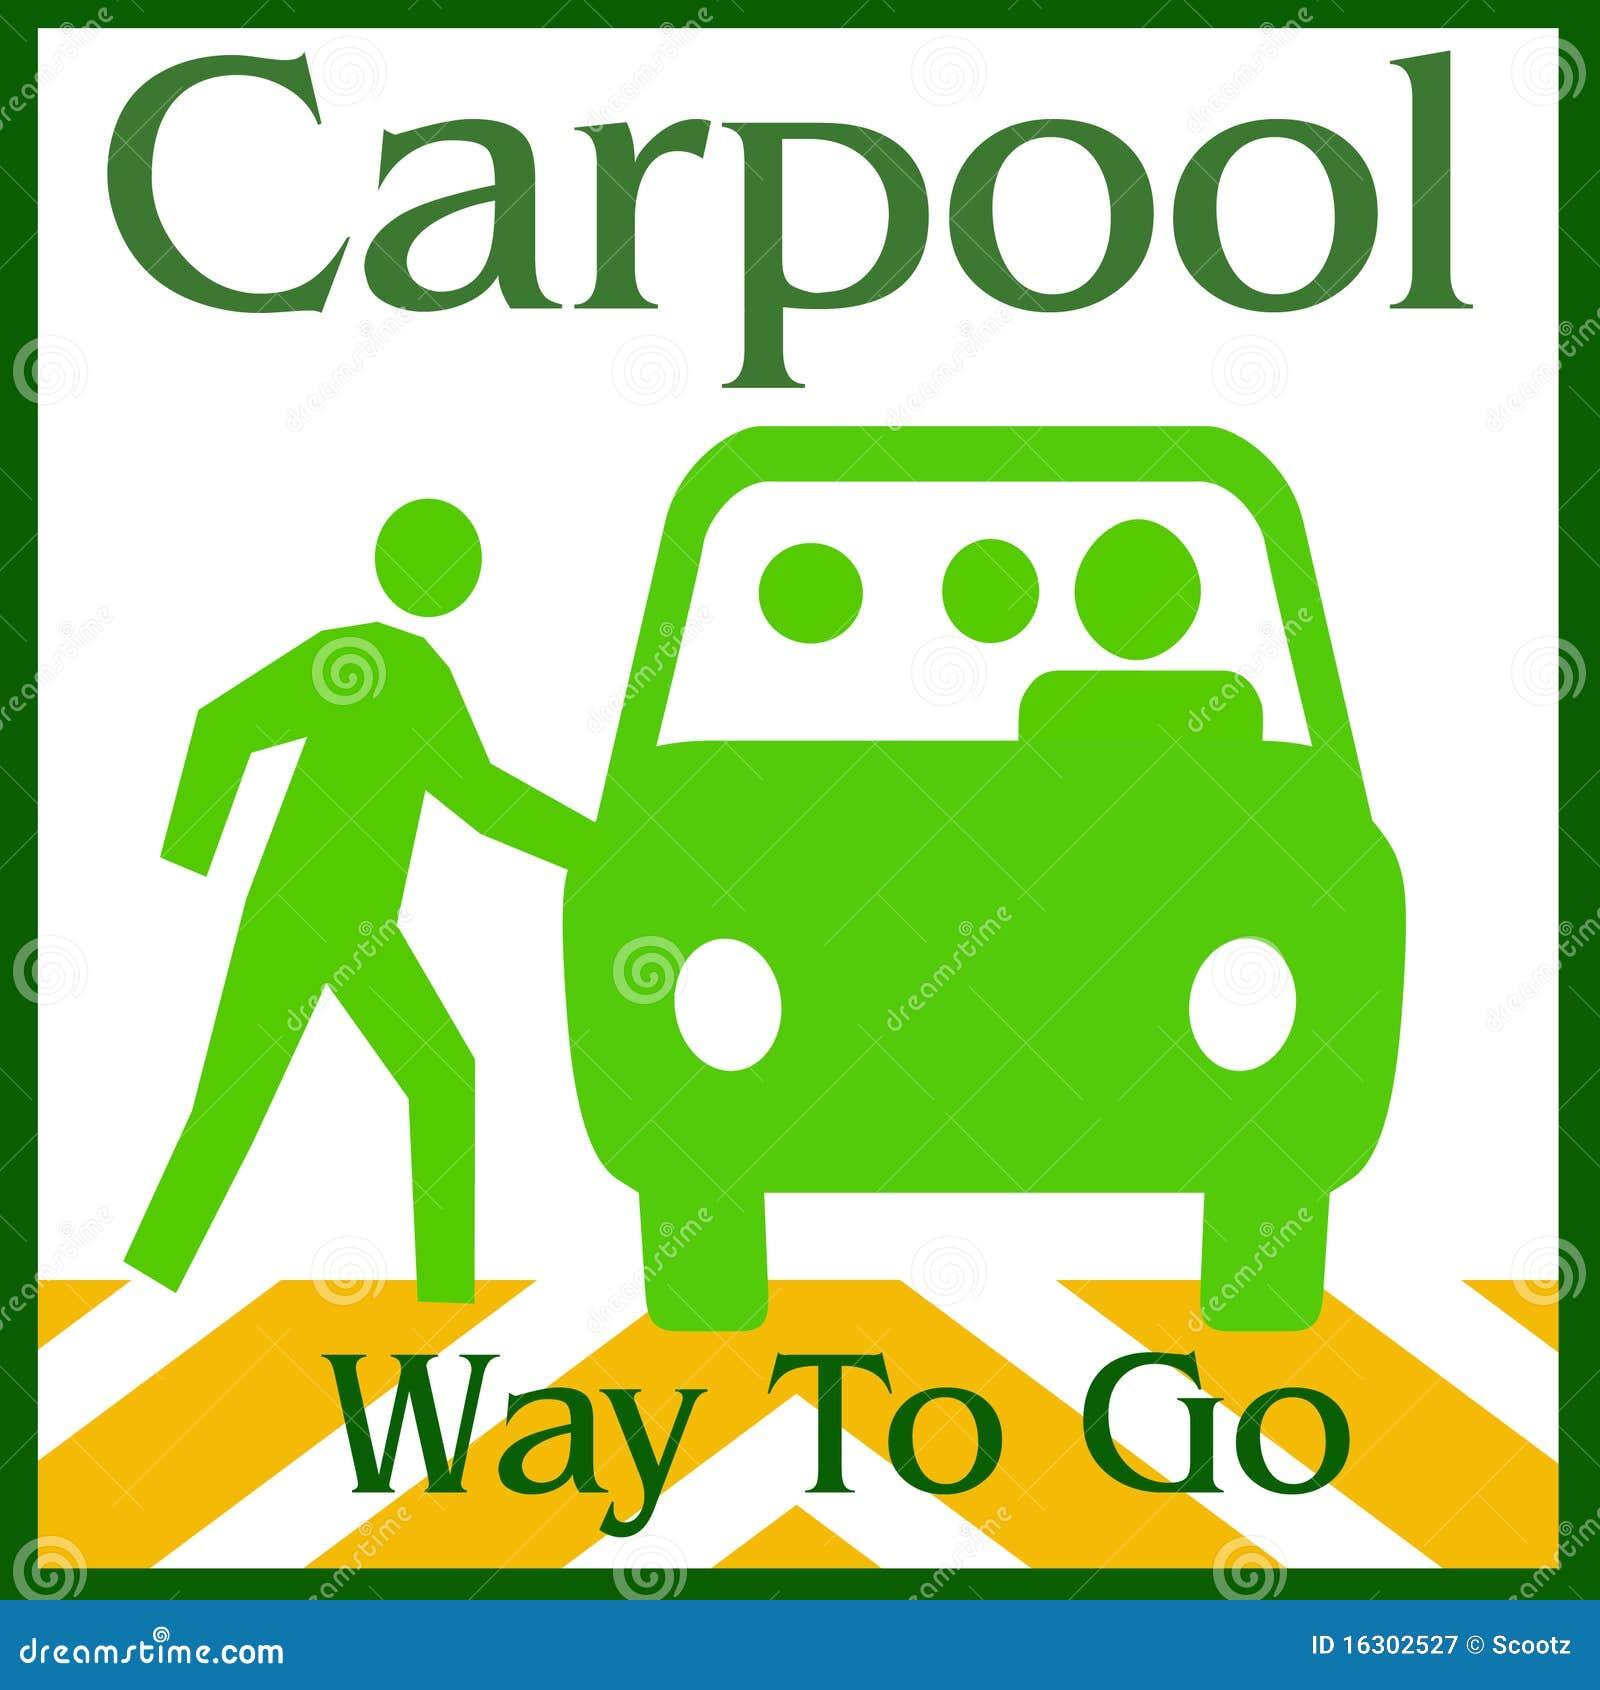 Carpool Stock Illustrations – 90 Carpool Stock Illustrations ...